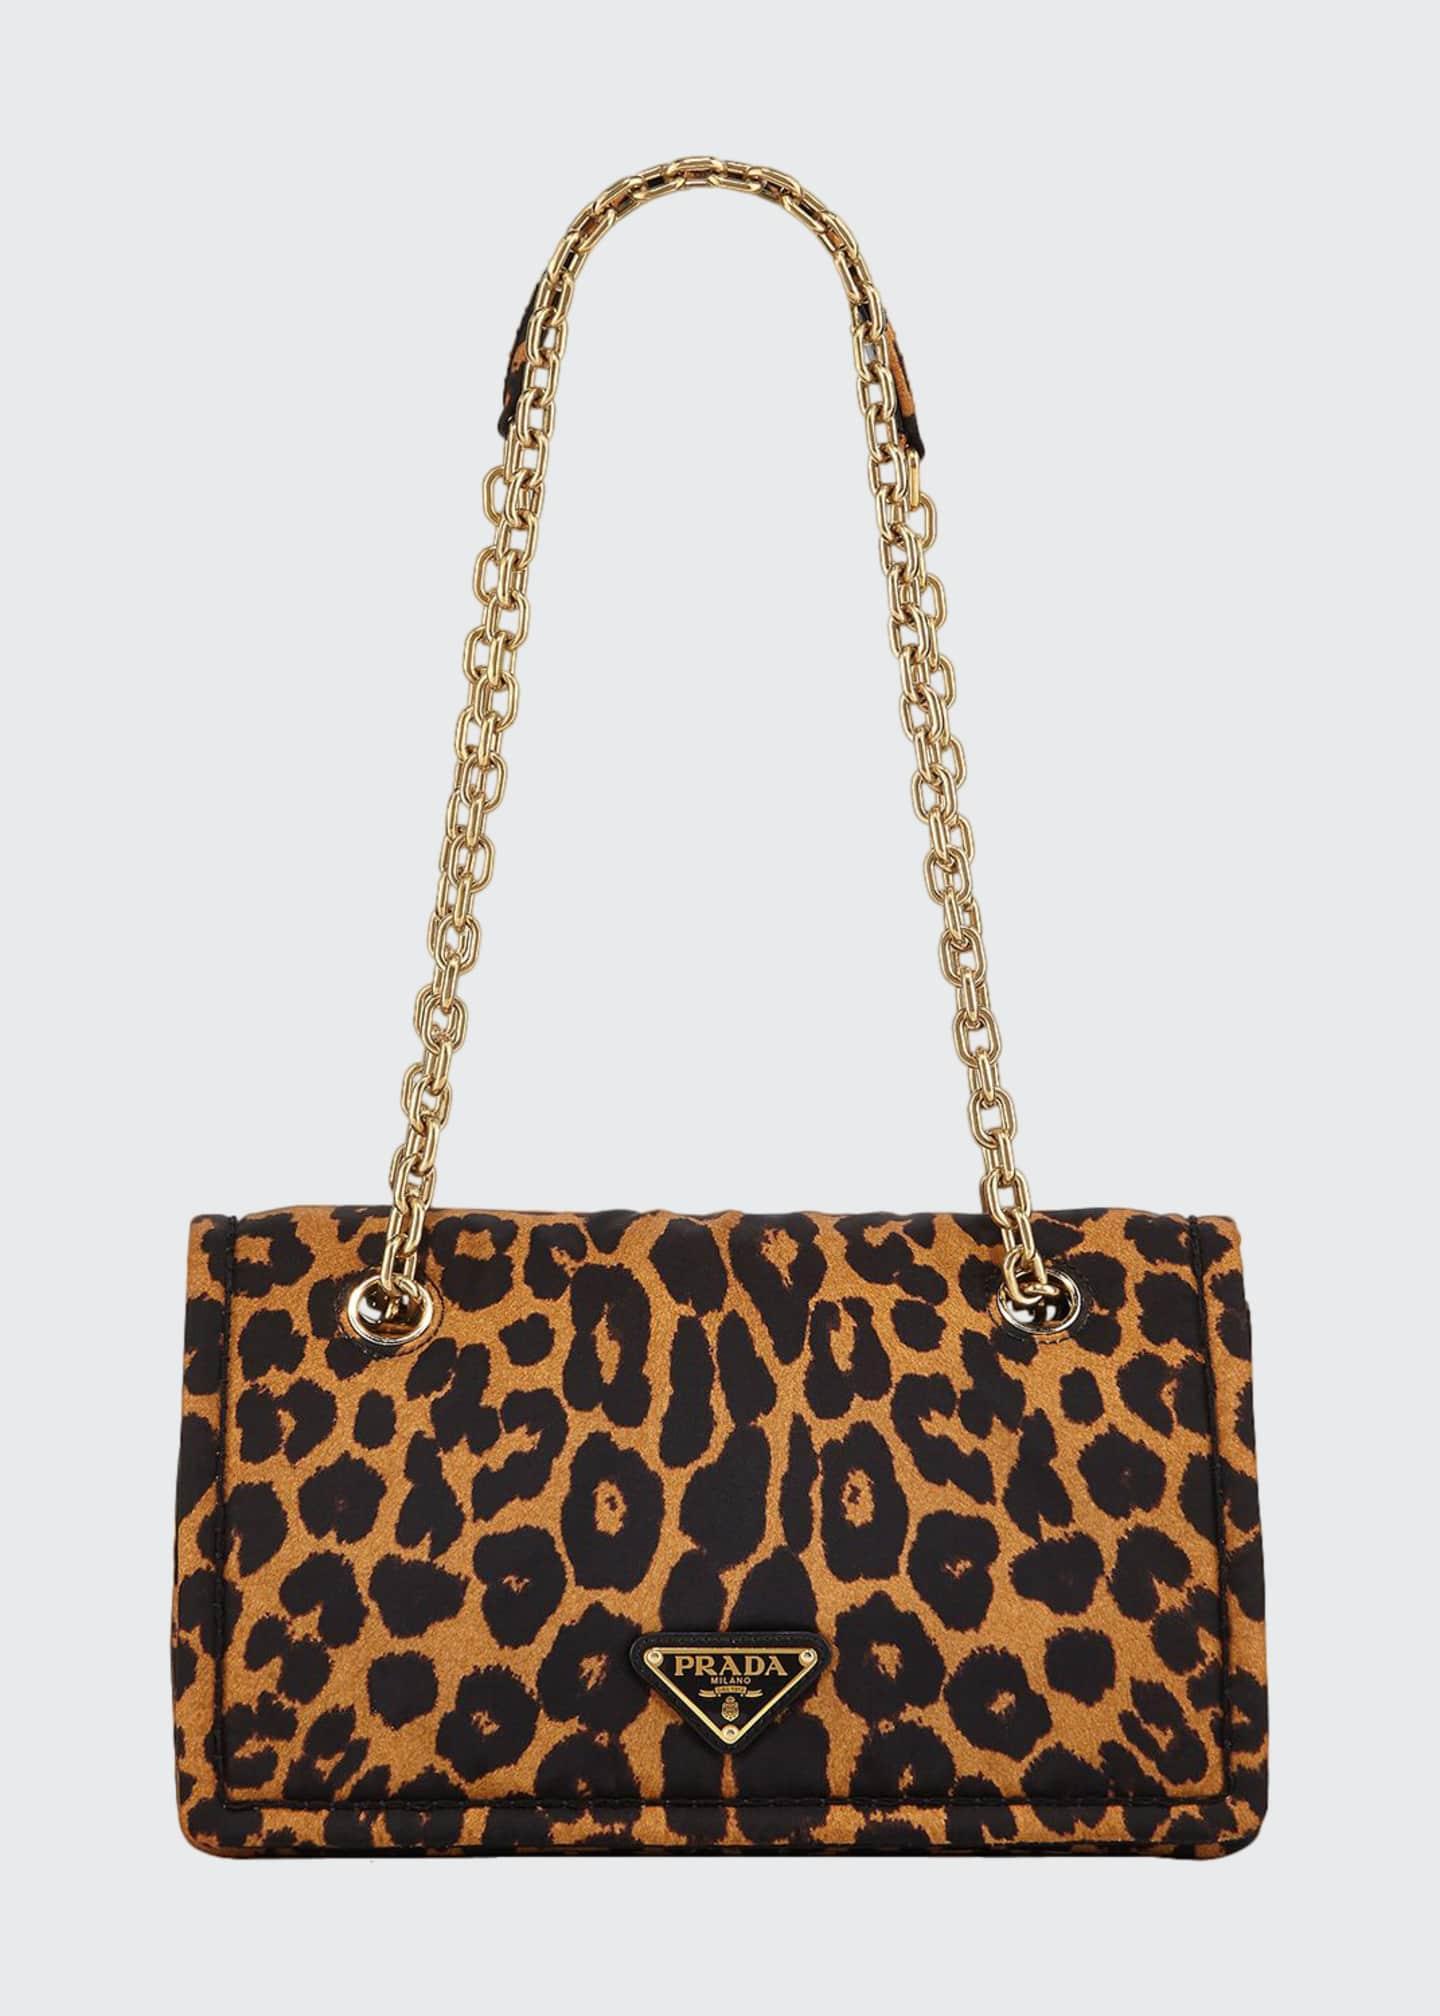 Prada Leopard-Print Nylon Shoulder Bag